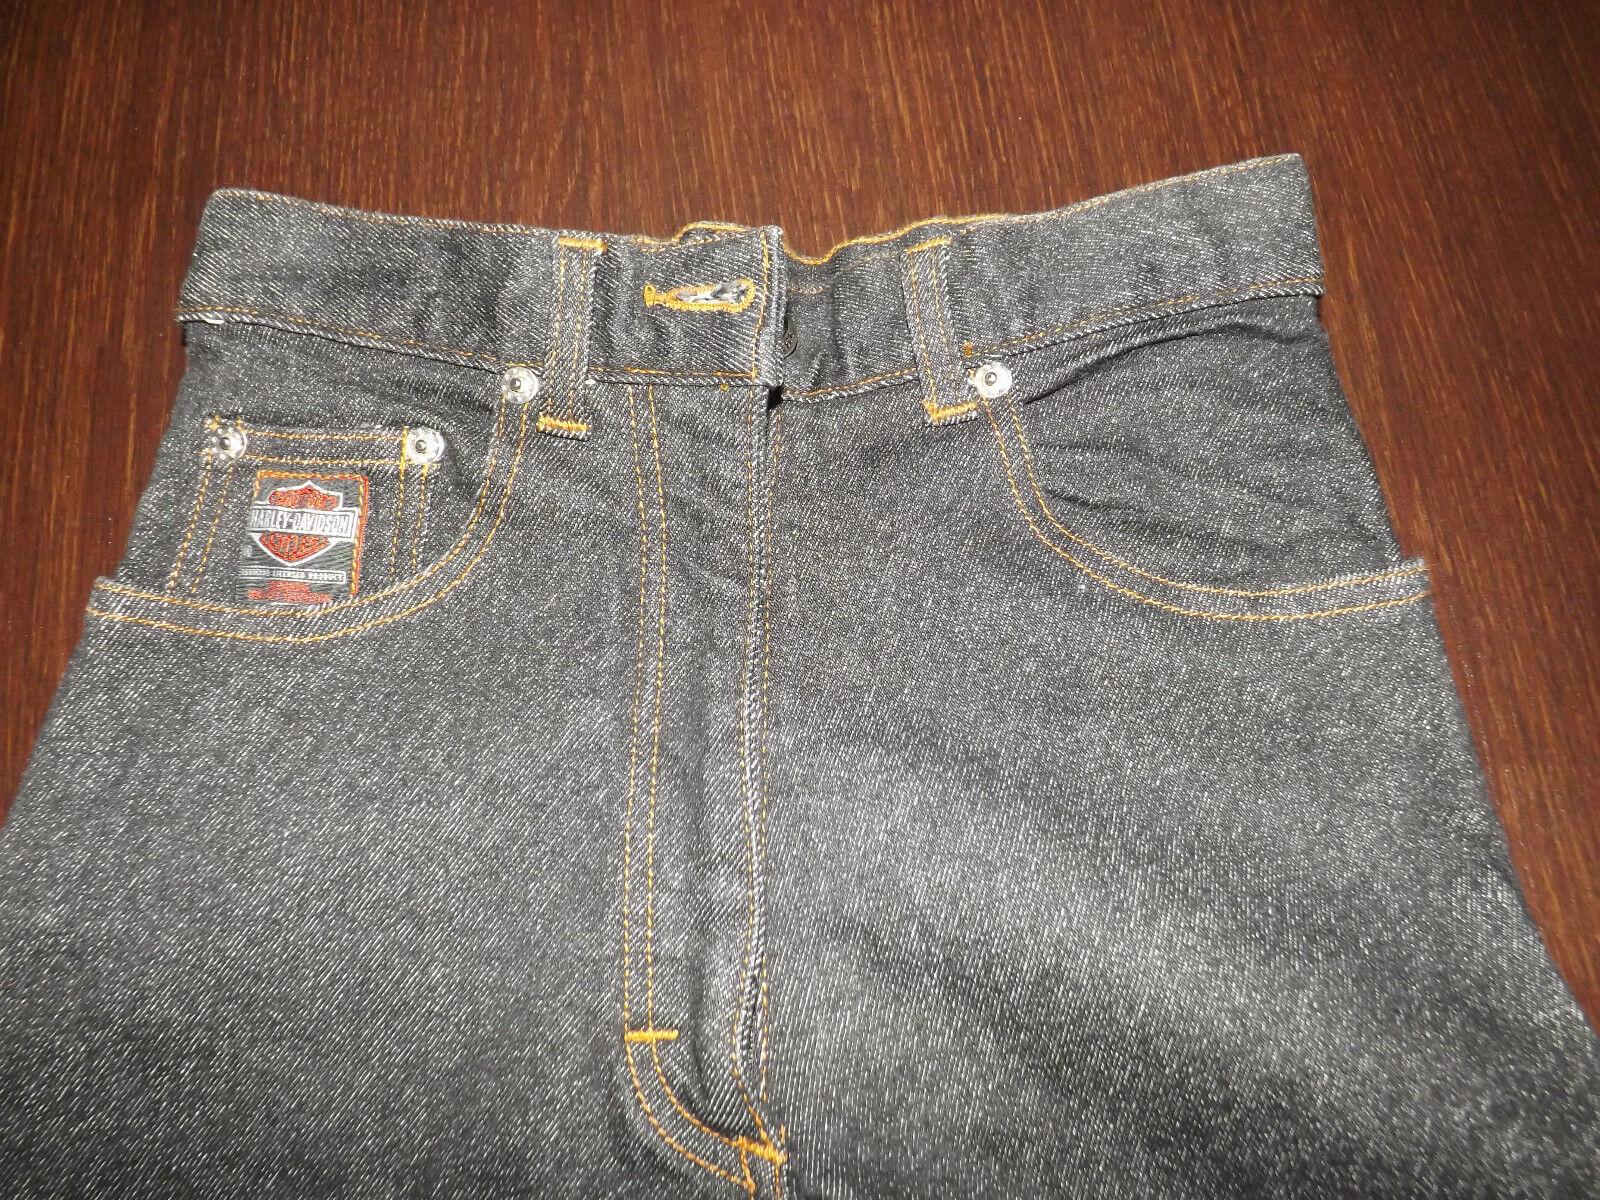 Jeans donna HARLEY DAVIDSON nuovi, vita cm 31